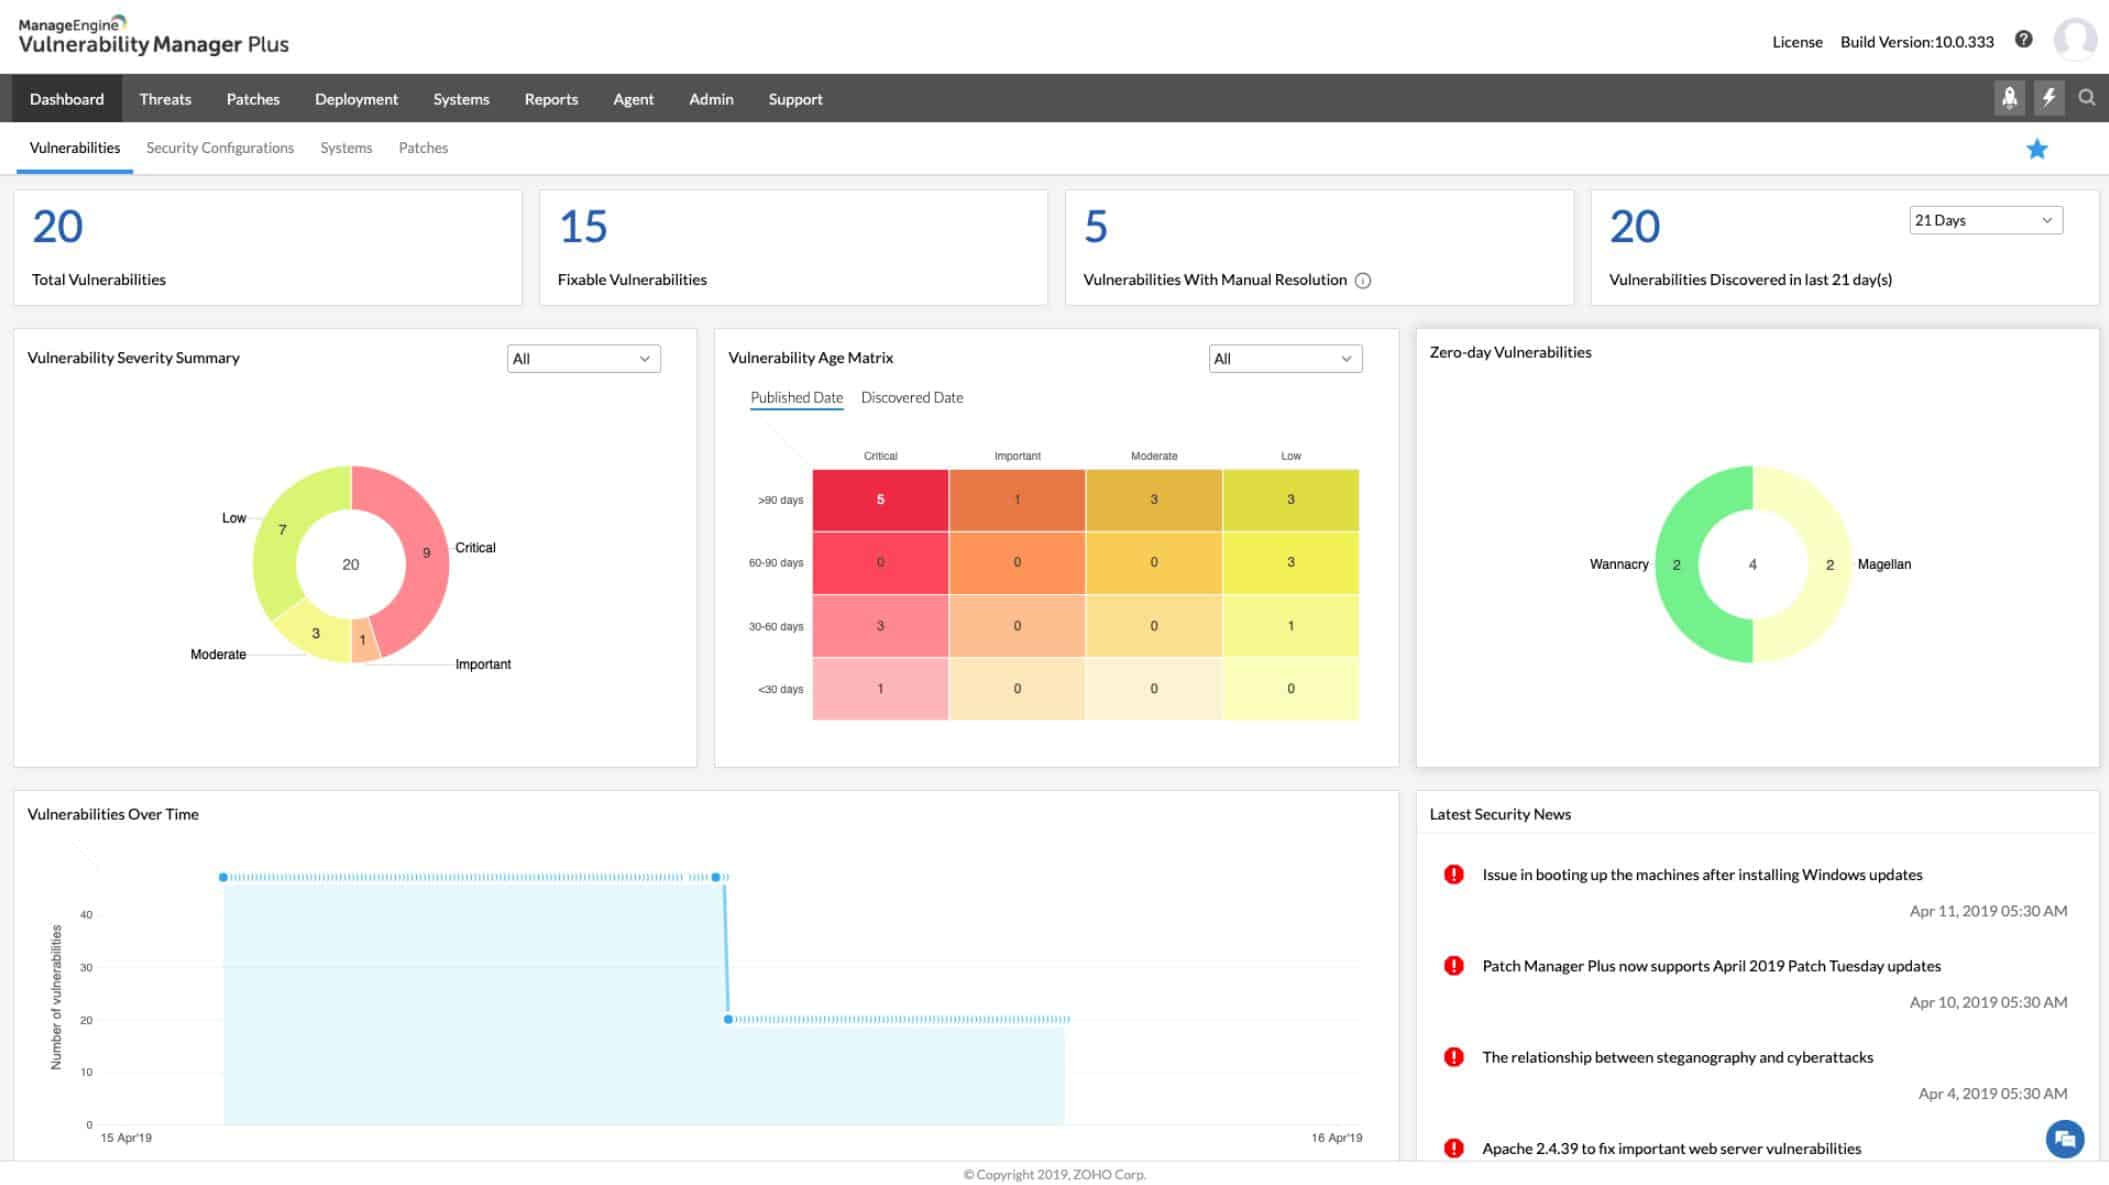 ManageEngine Vulnerabilty Manager Plus